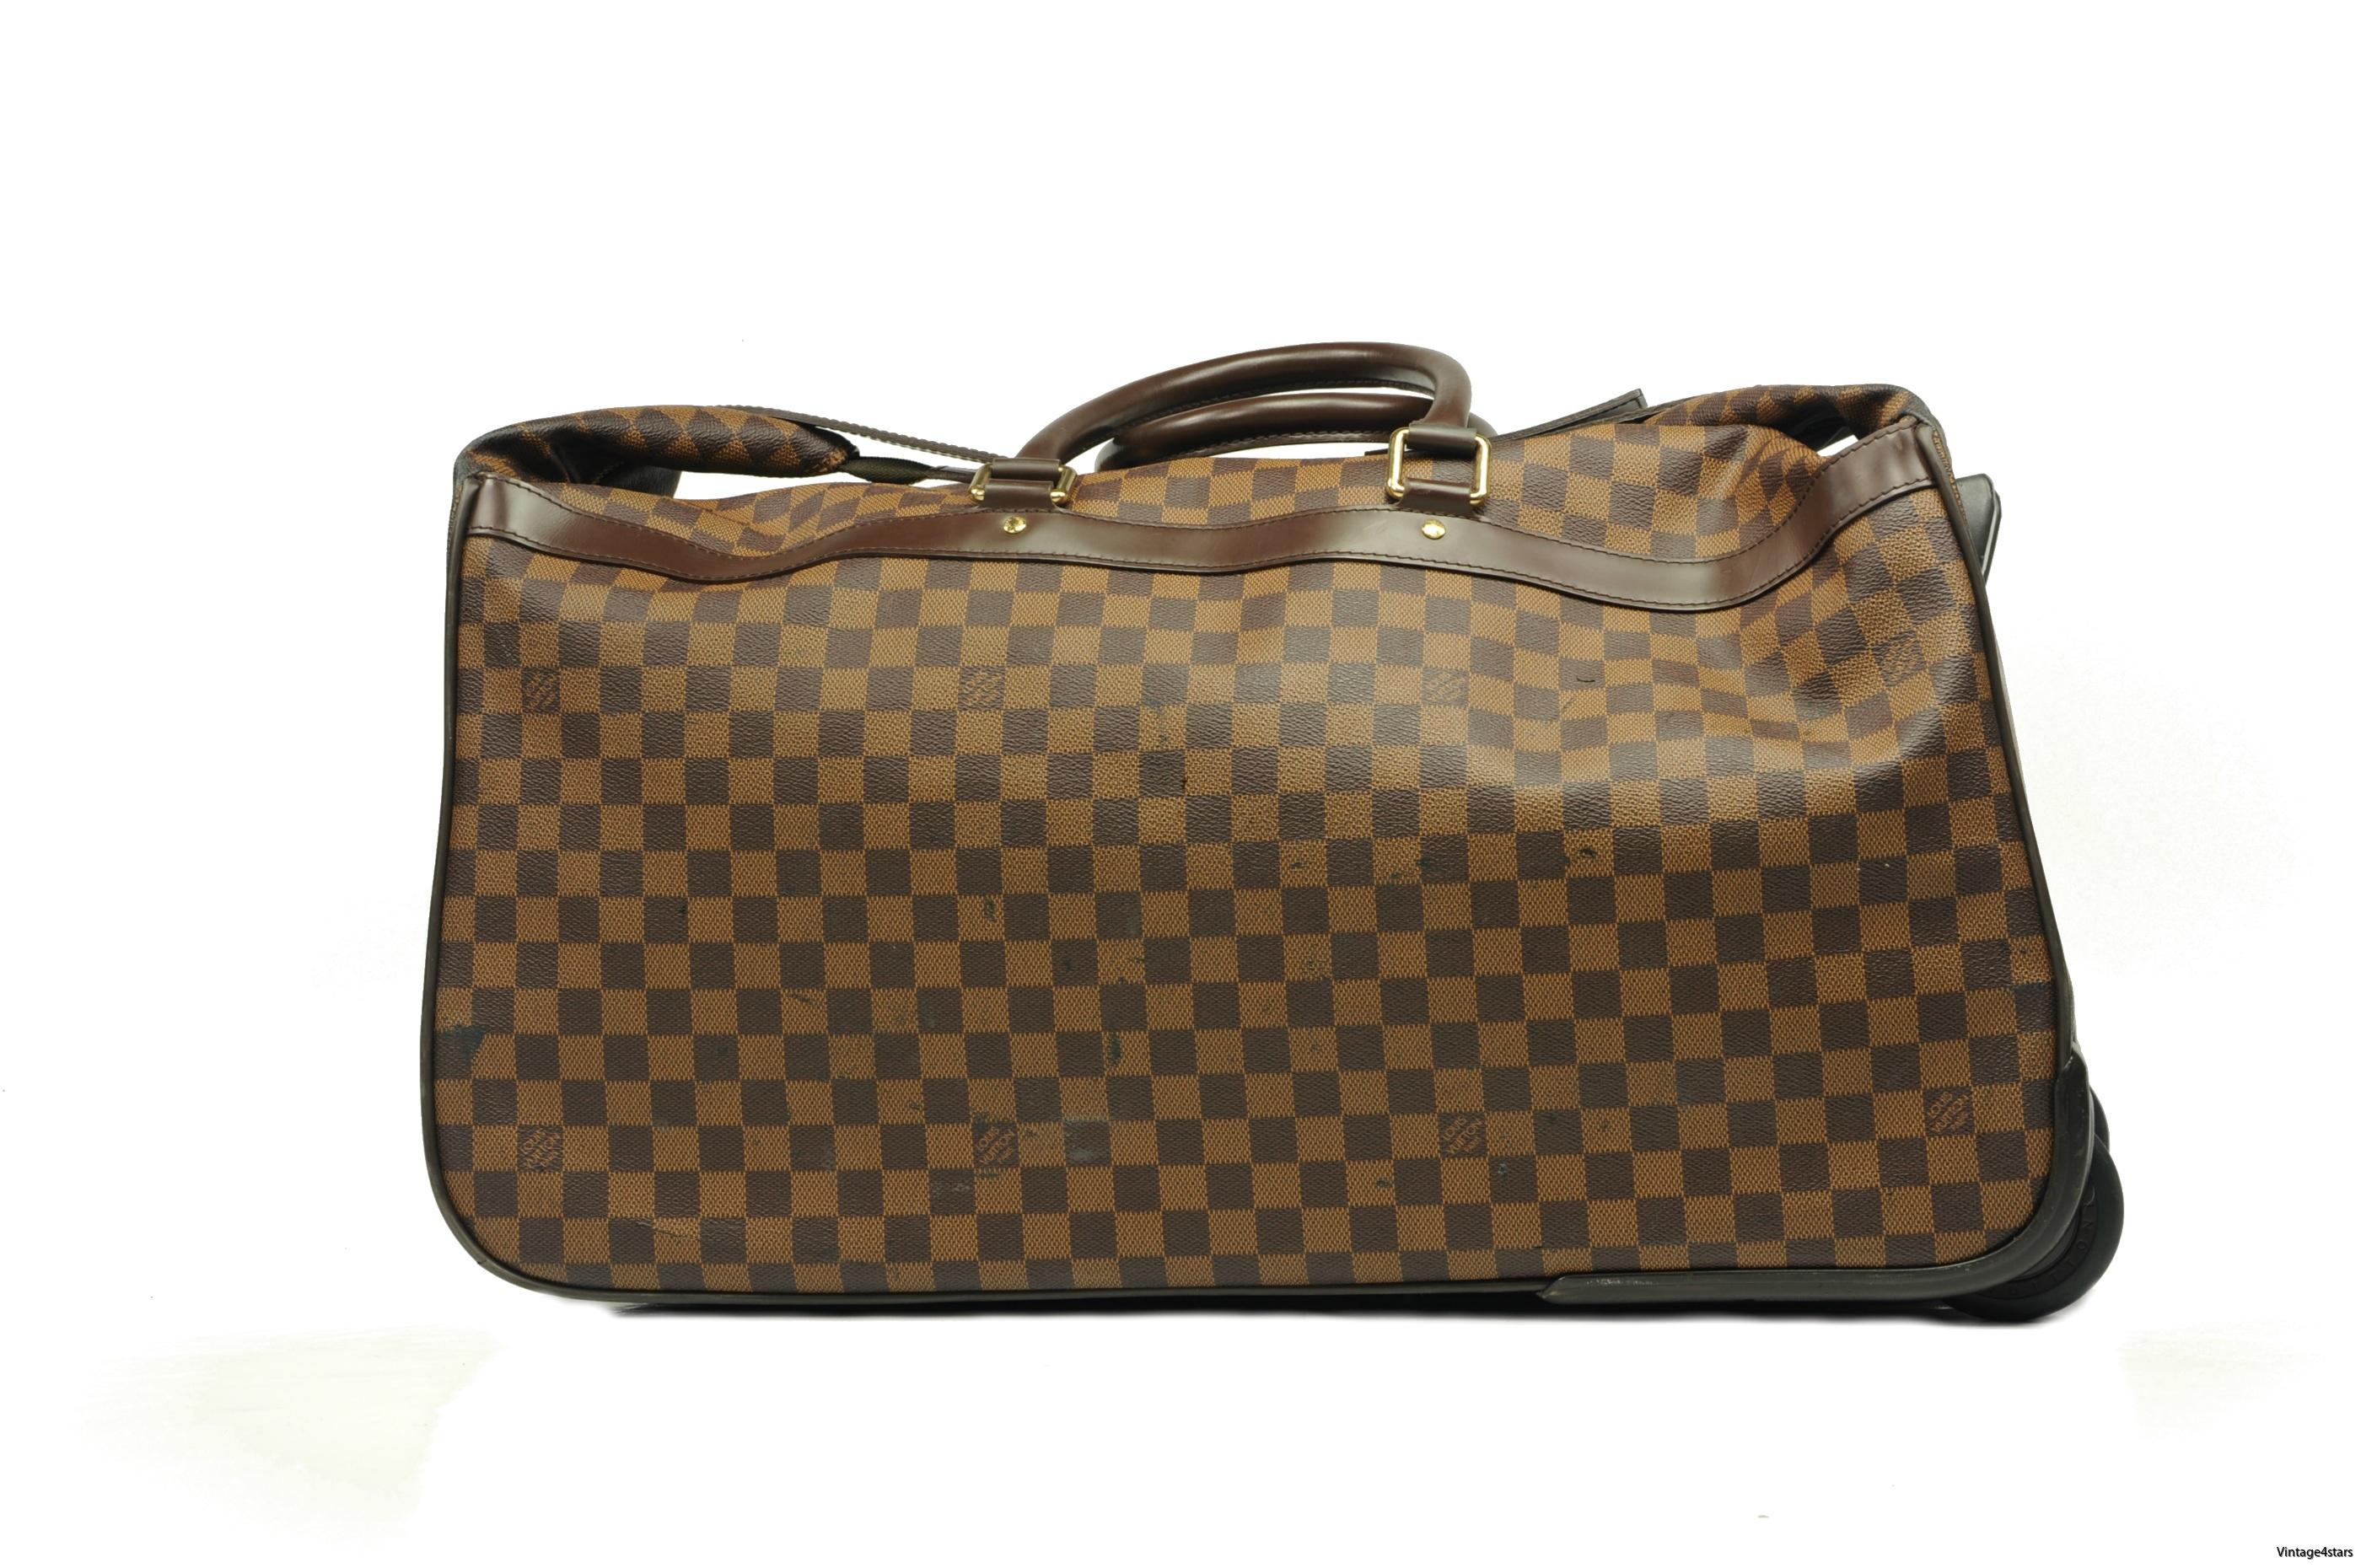 Louis Vuitton Eole 60 Damier Ebene 5